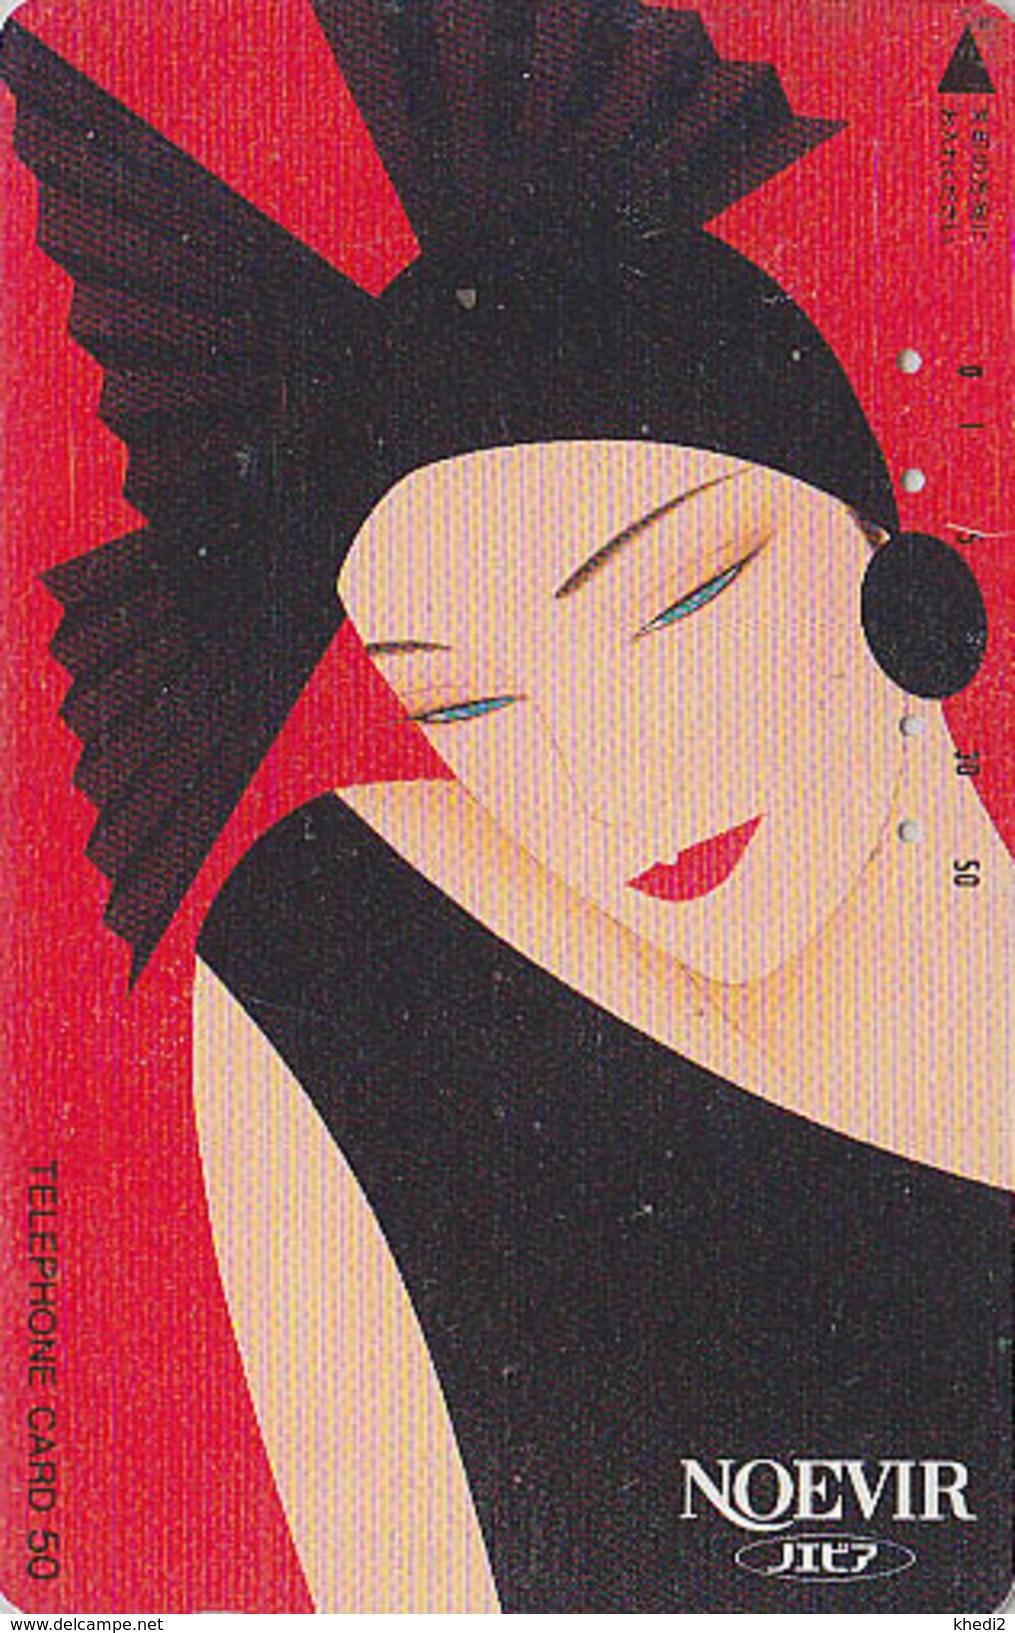 Télécarte Japon / 110-28535 - Cosmétiques NOEVIR / Femme - Girl Japan Cosmetics Phonecard Parfum Perfume - 236 - Parfum